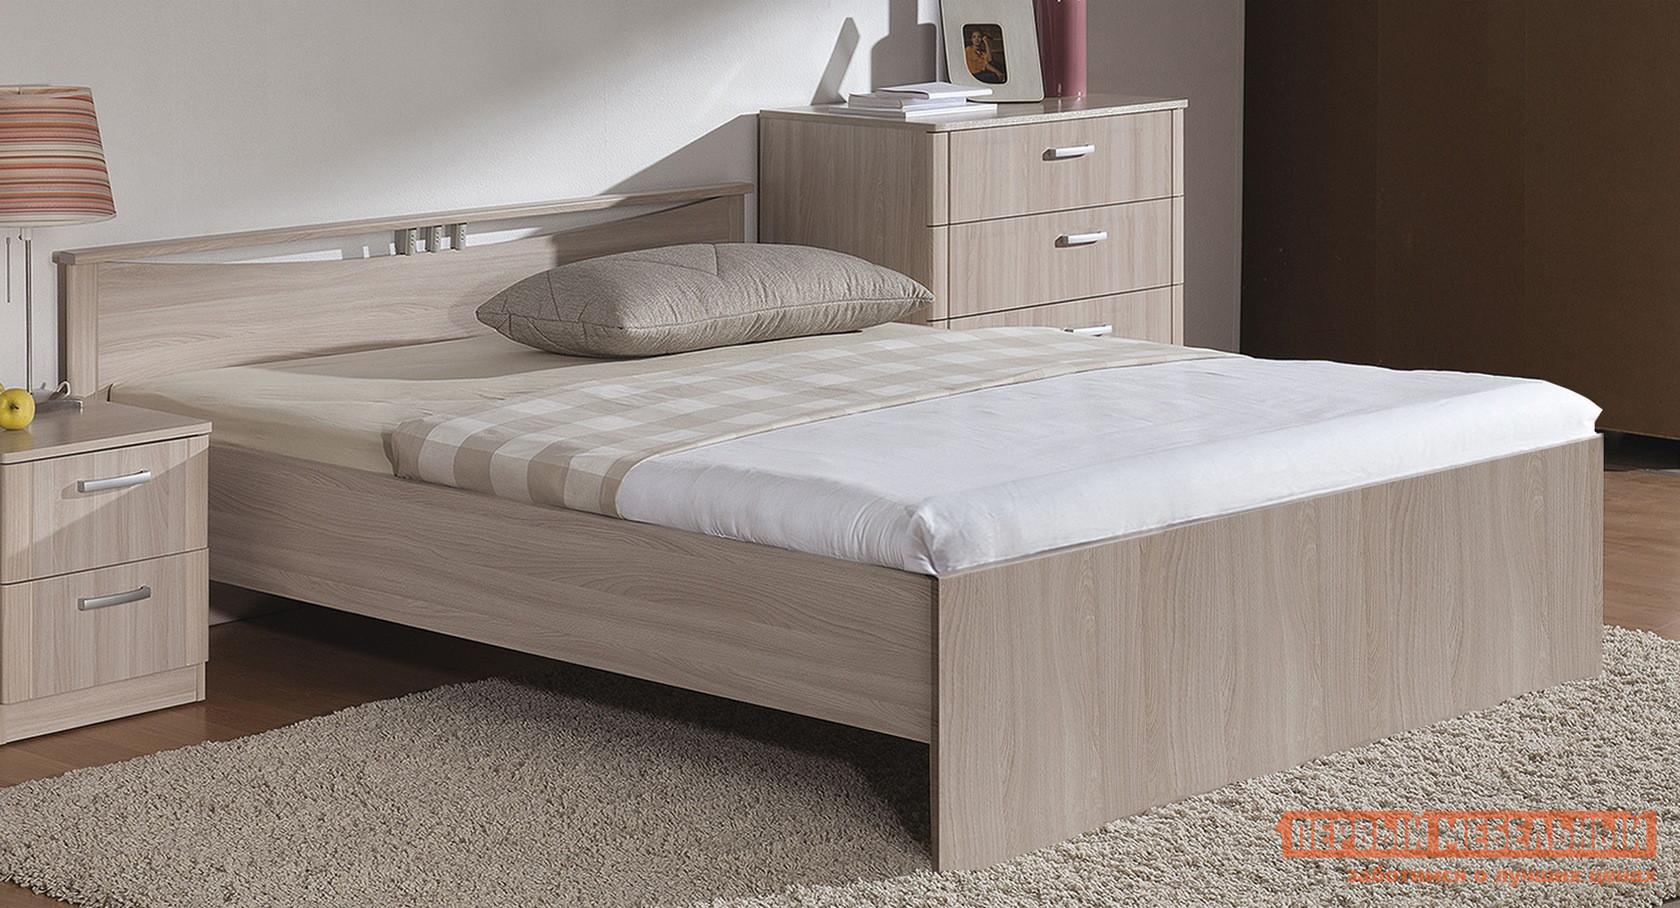 Кровать Боровичи Мелисса Шимо светлый, Без матраса, 1600 Х 2000 мм